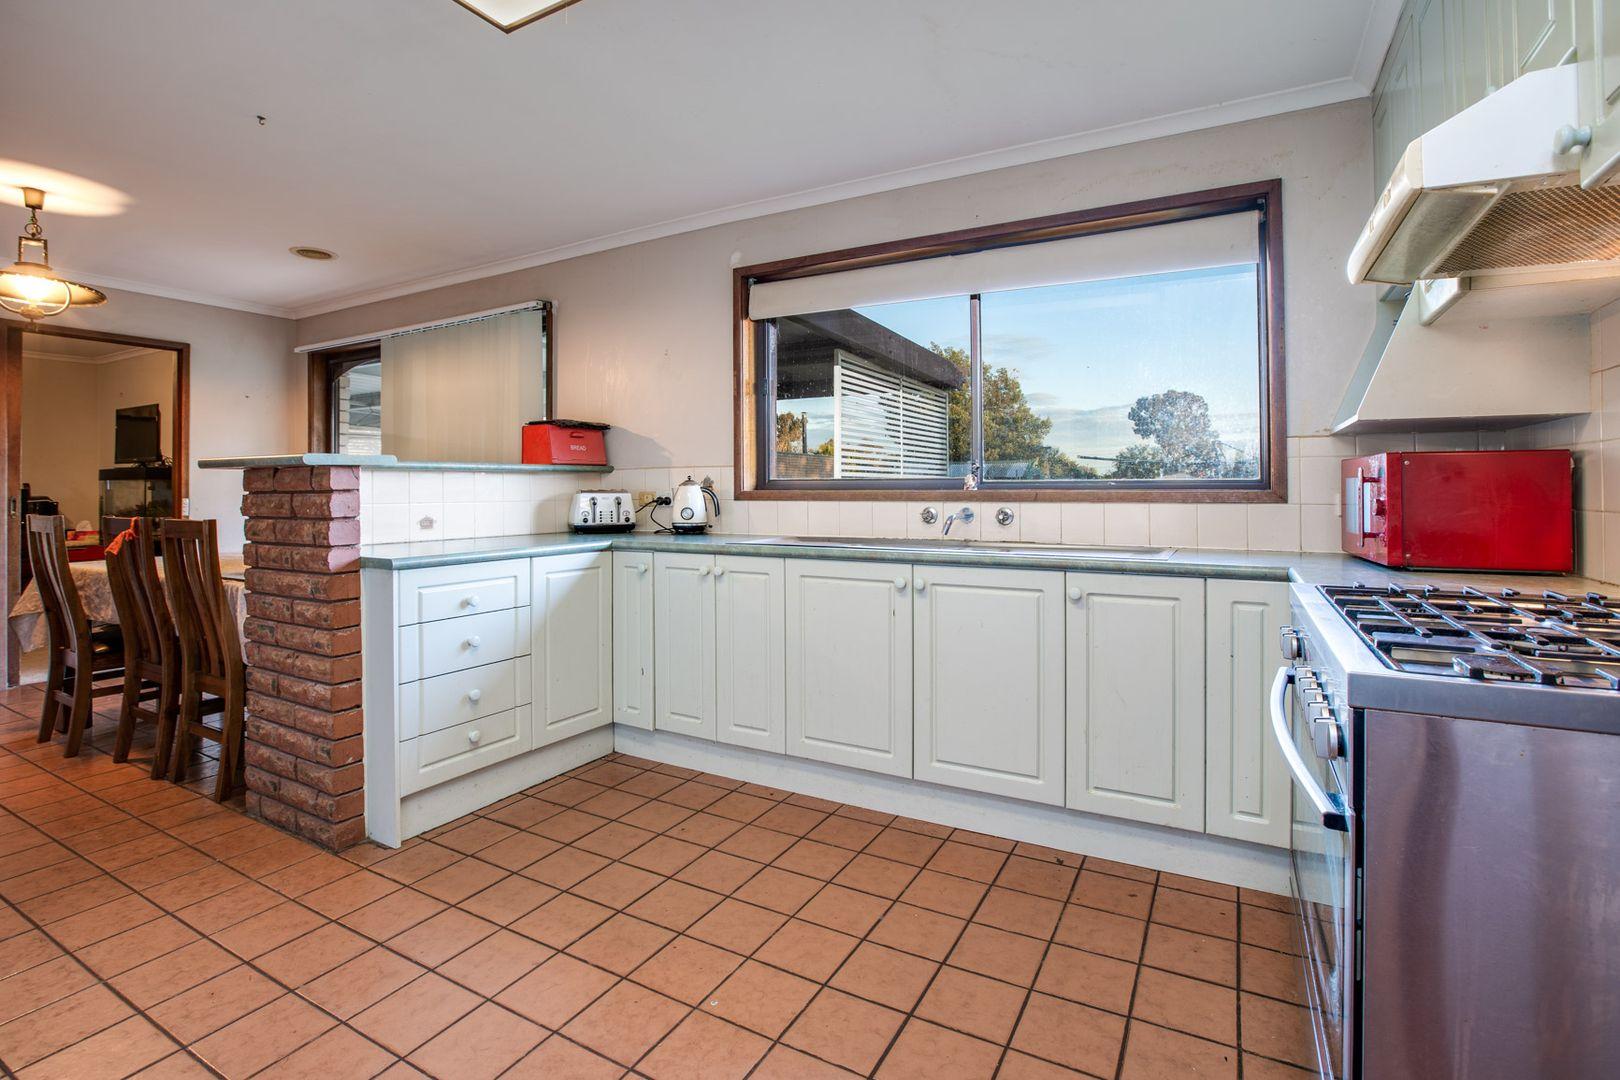 106 Pell Street, Howlong NSW 2643, Image 2